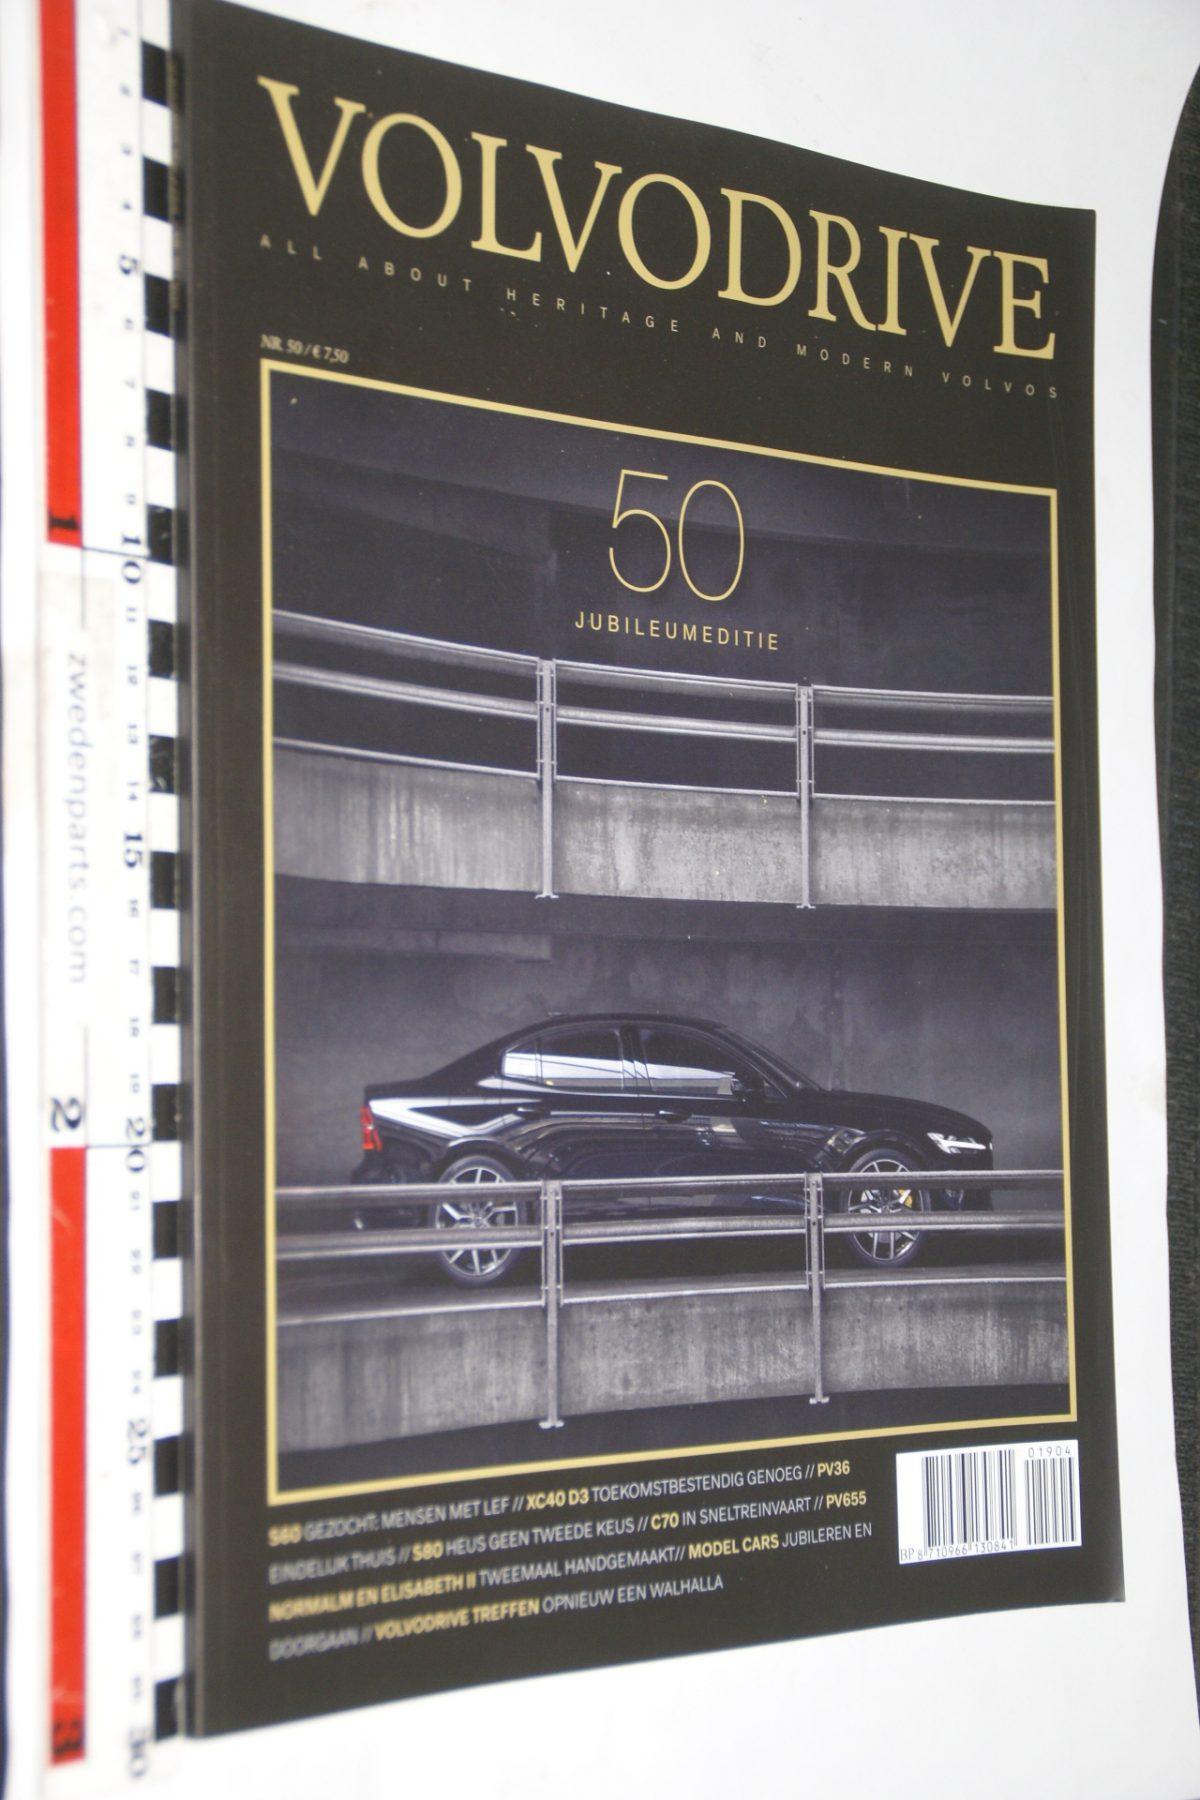 DSC05095 2019 tijdschrift Volvodrive nr 50